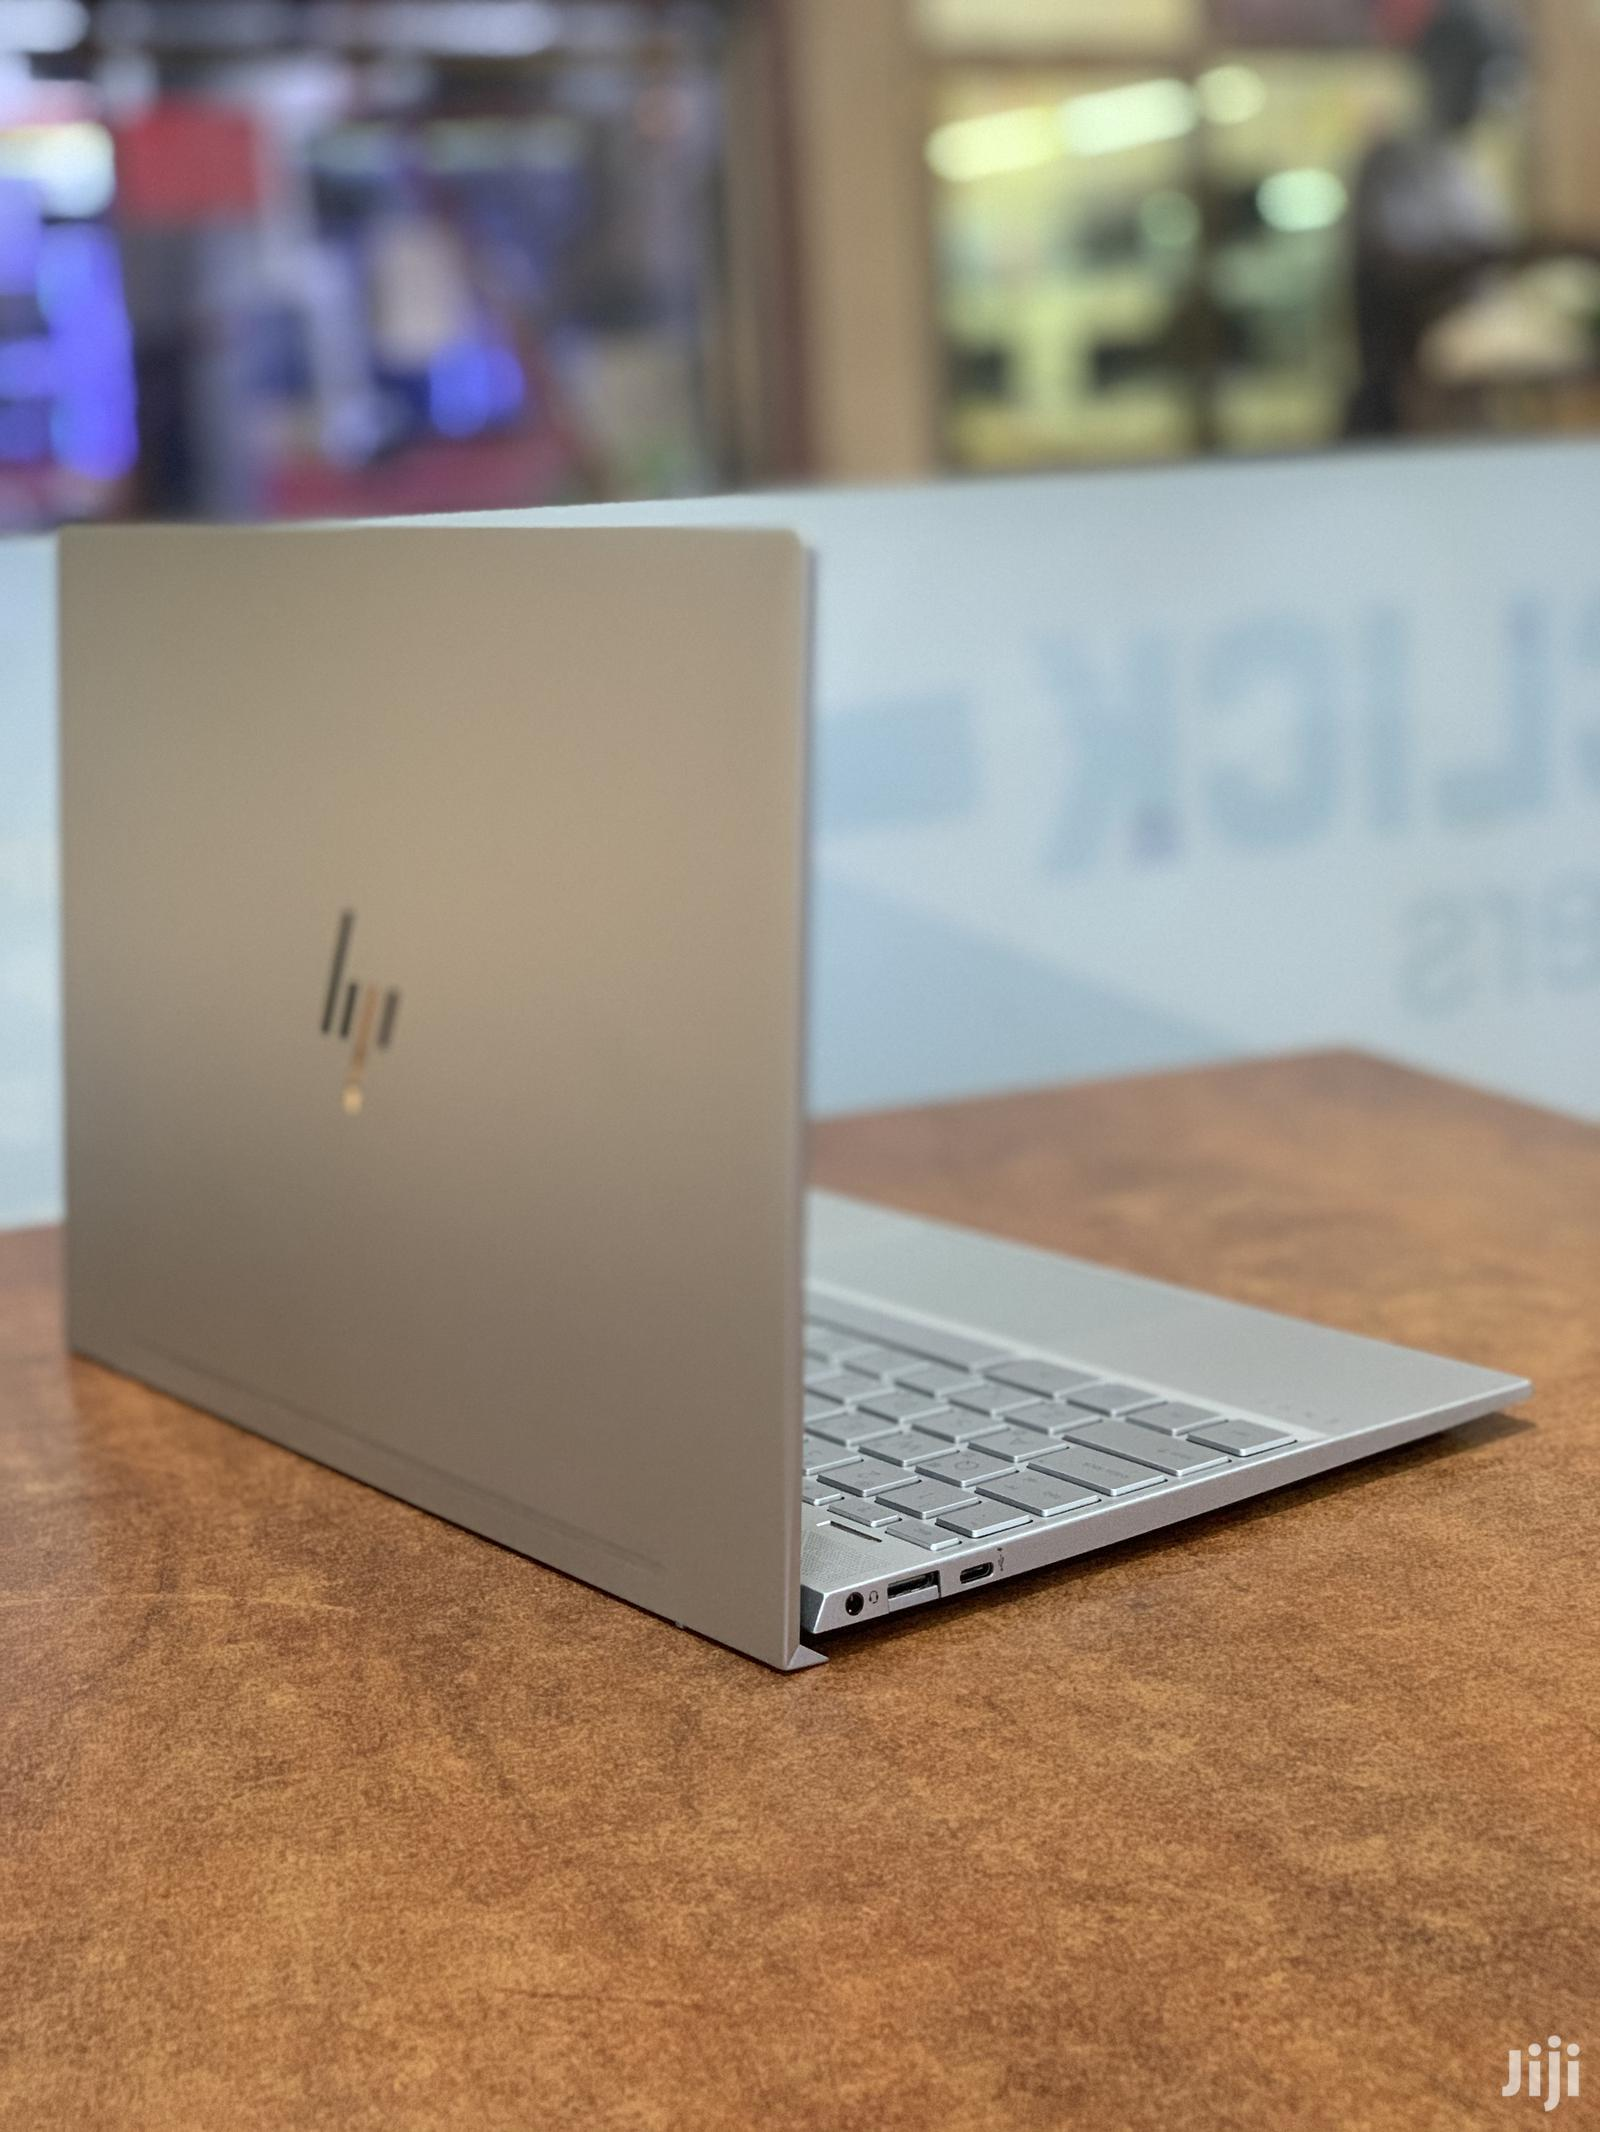 New Laptop HP Envy 13 8GB Intel Core i5 SSHD (Hybrid) 256GB   Laptops & Computers for sale in Kampala, Central Region, Uganda